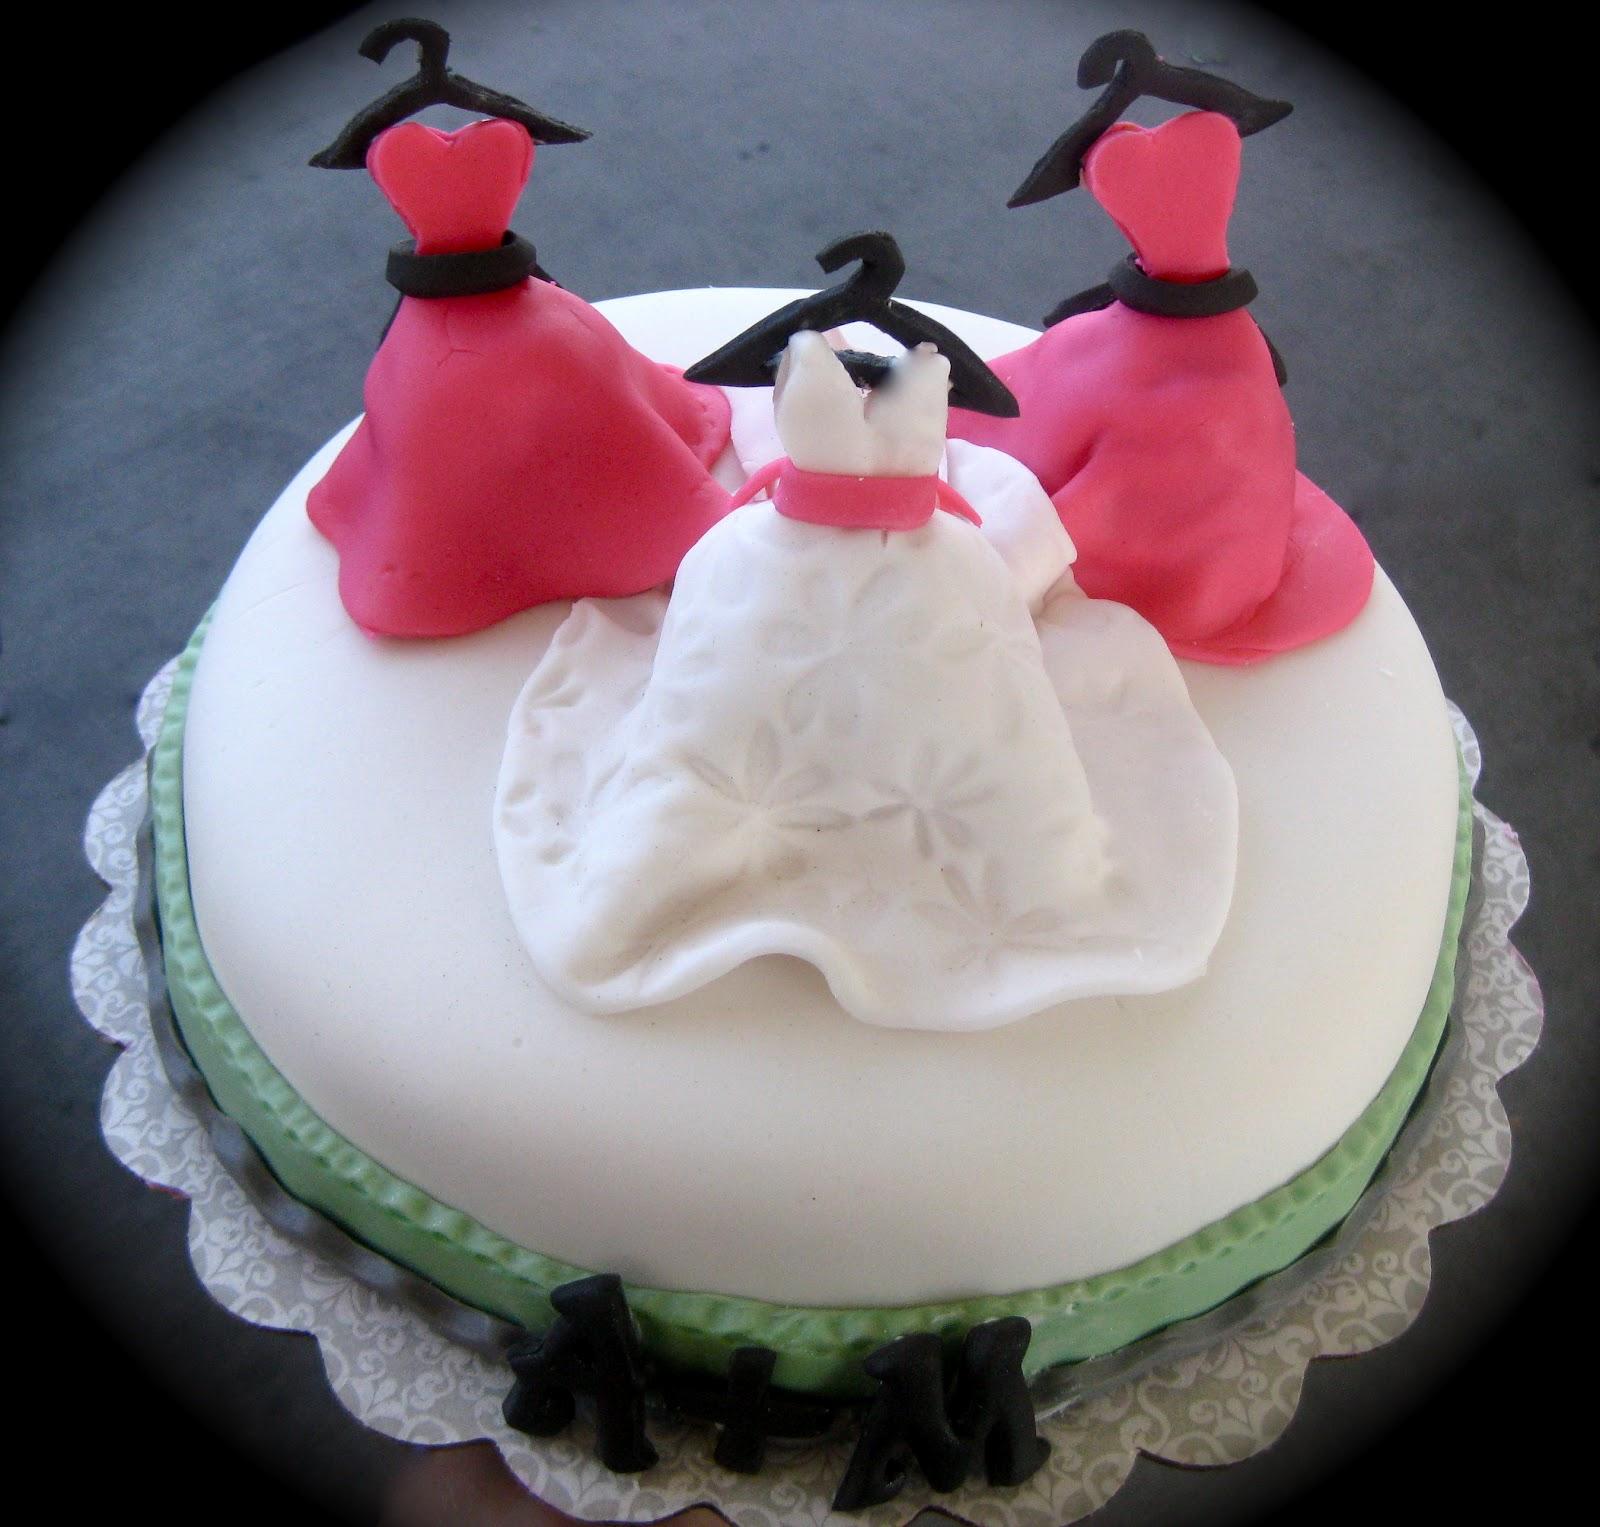 Pre Wedding Gifts: The Cake Baketress: Pre-wedding Bridal Bliss